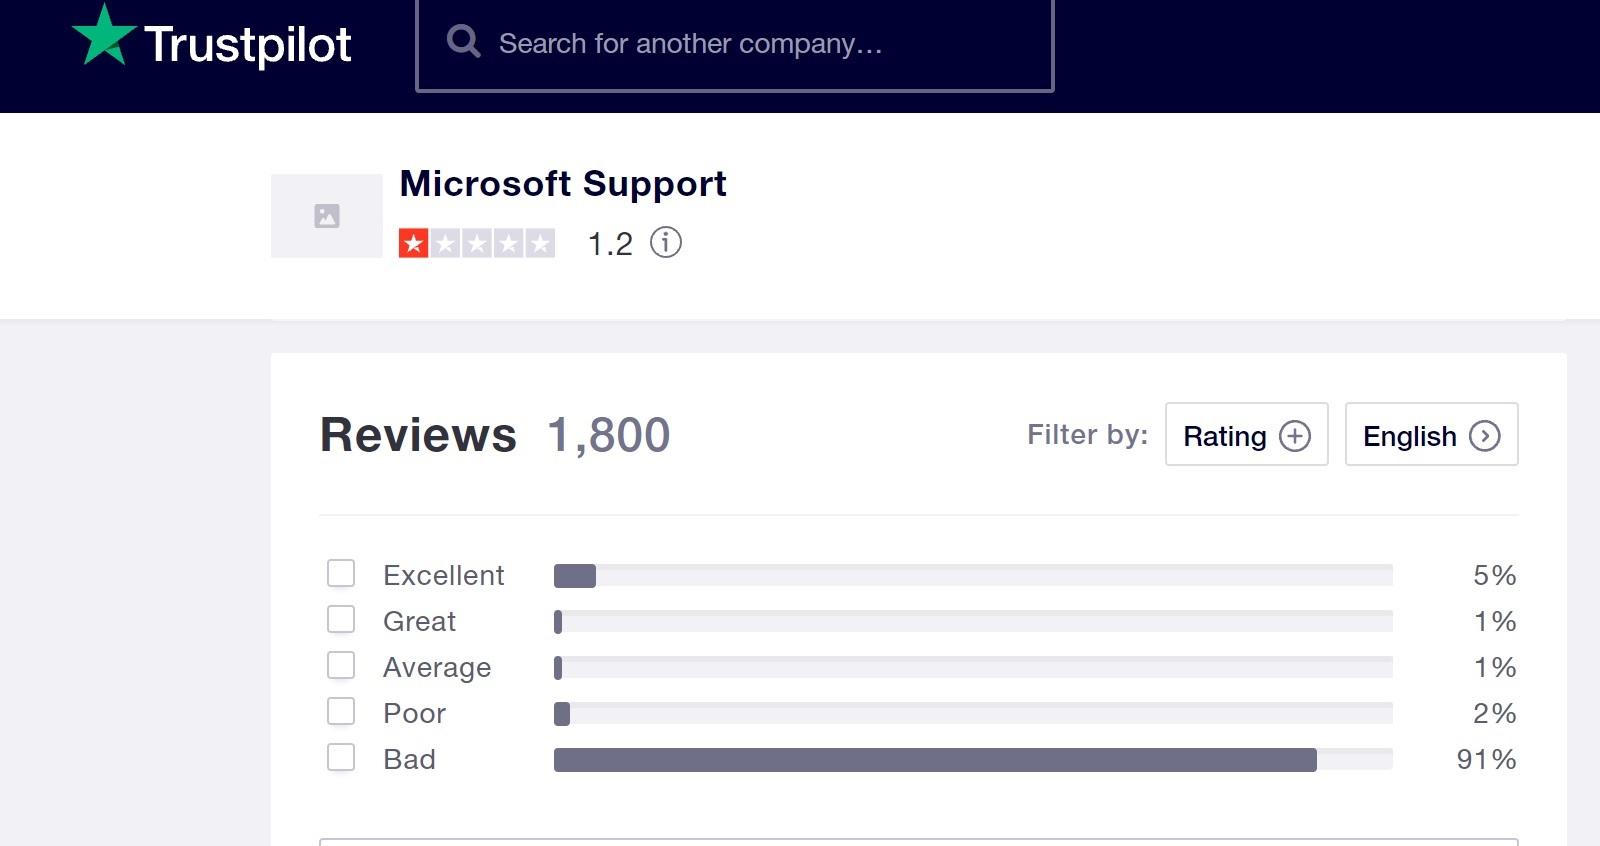 microsoft support trustpilot reviews